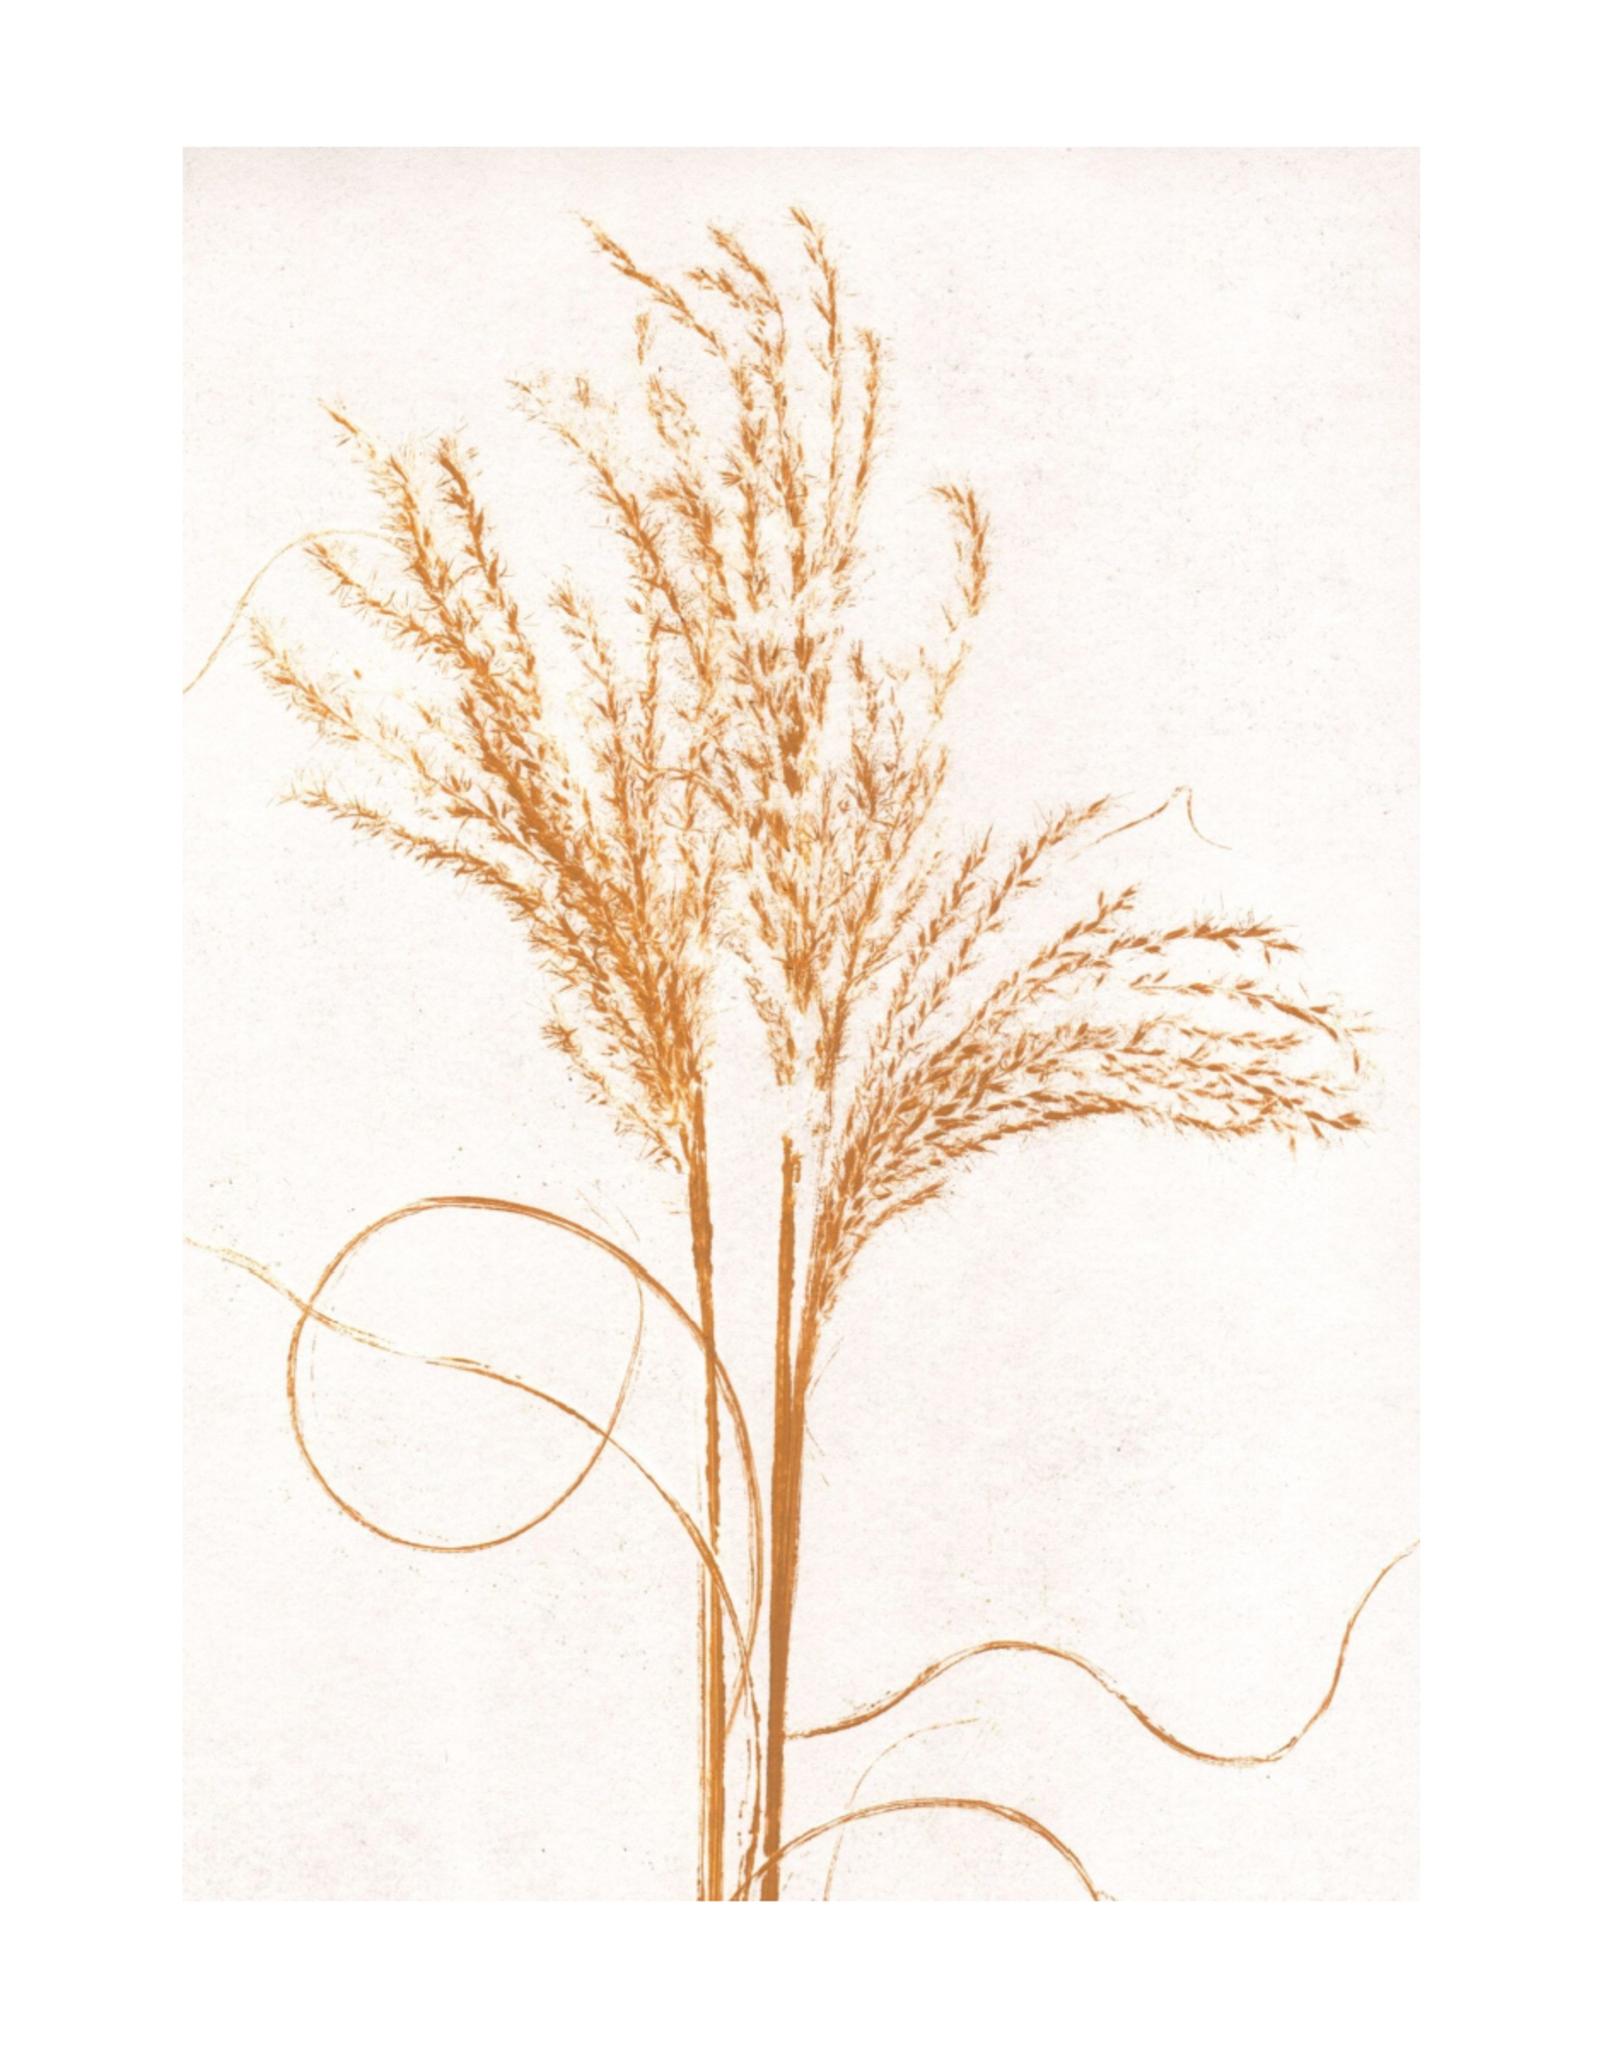 Pernille Folcarelli Artcard A5 Silvergrass Mustard